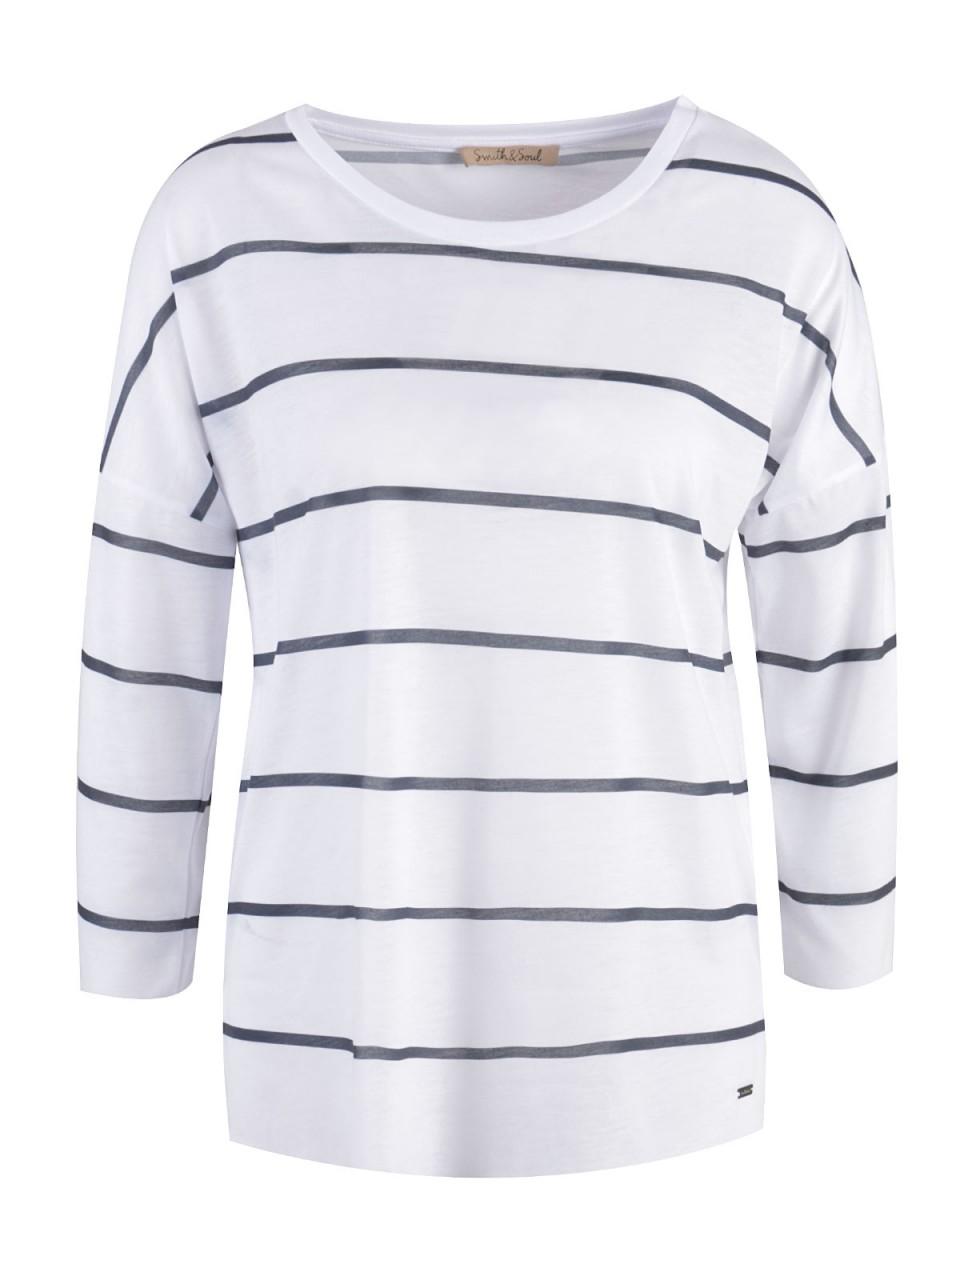 Oberteile - SMITH SOUL Damen Shirt, weiß  - Onlineshop Designermode.com